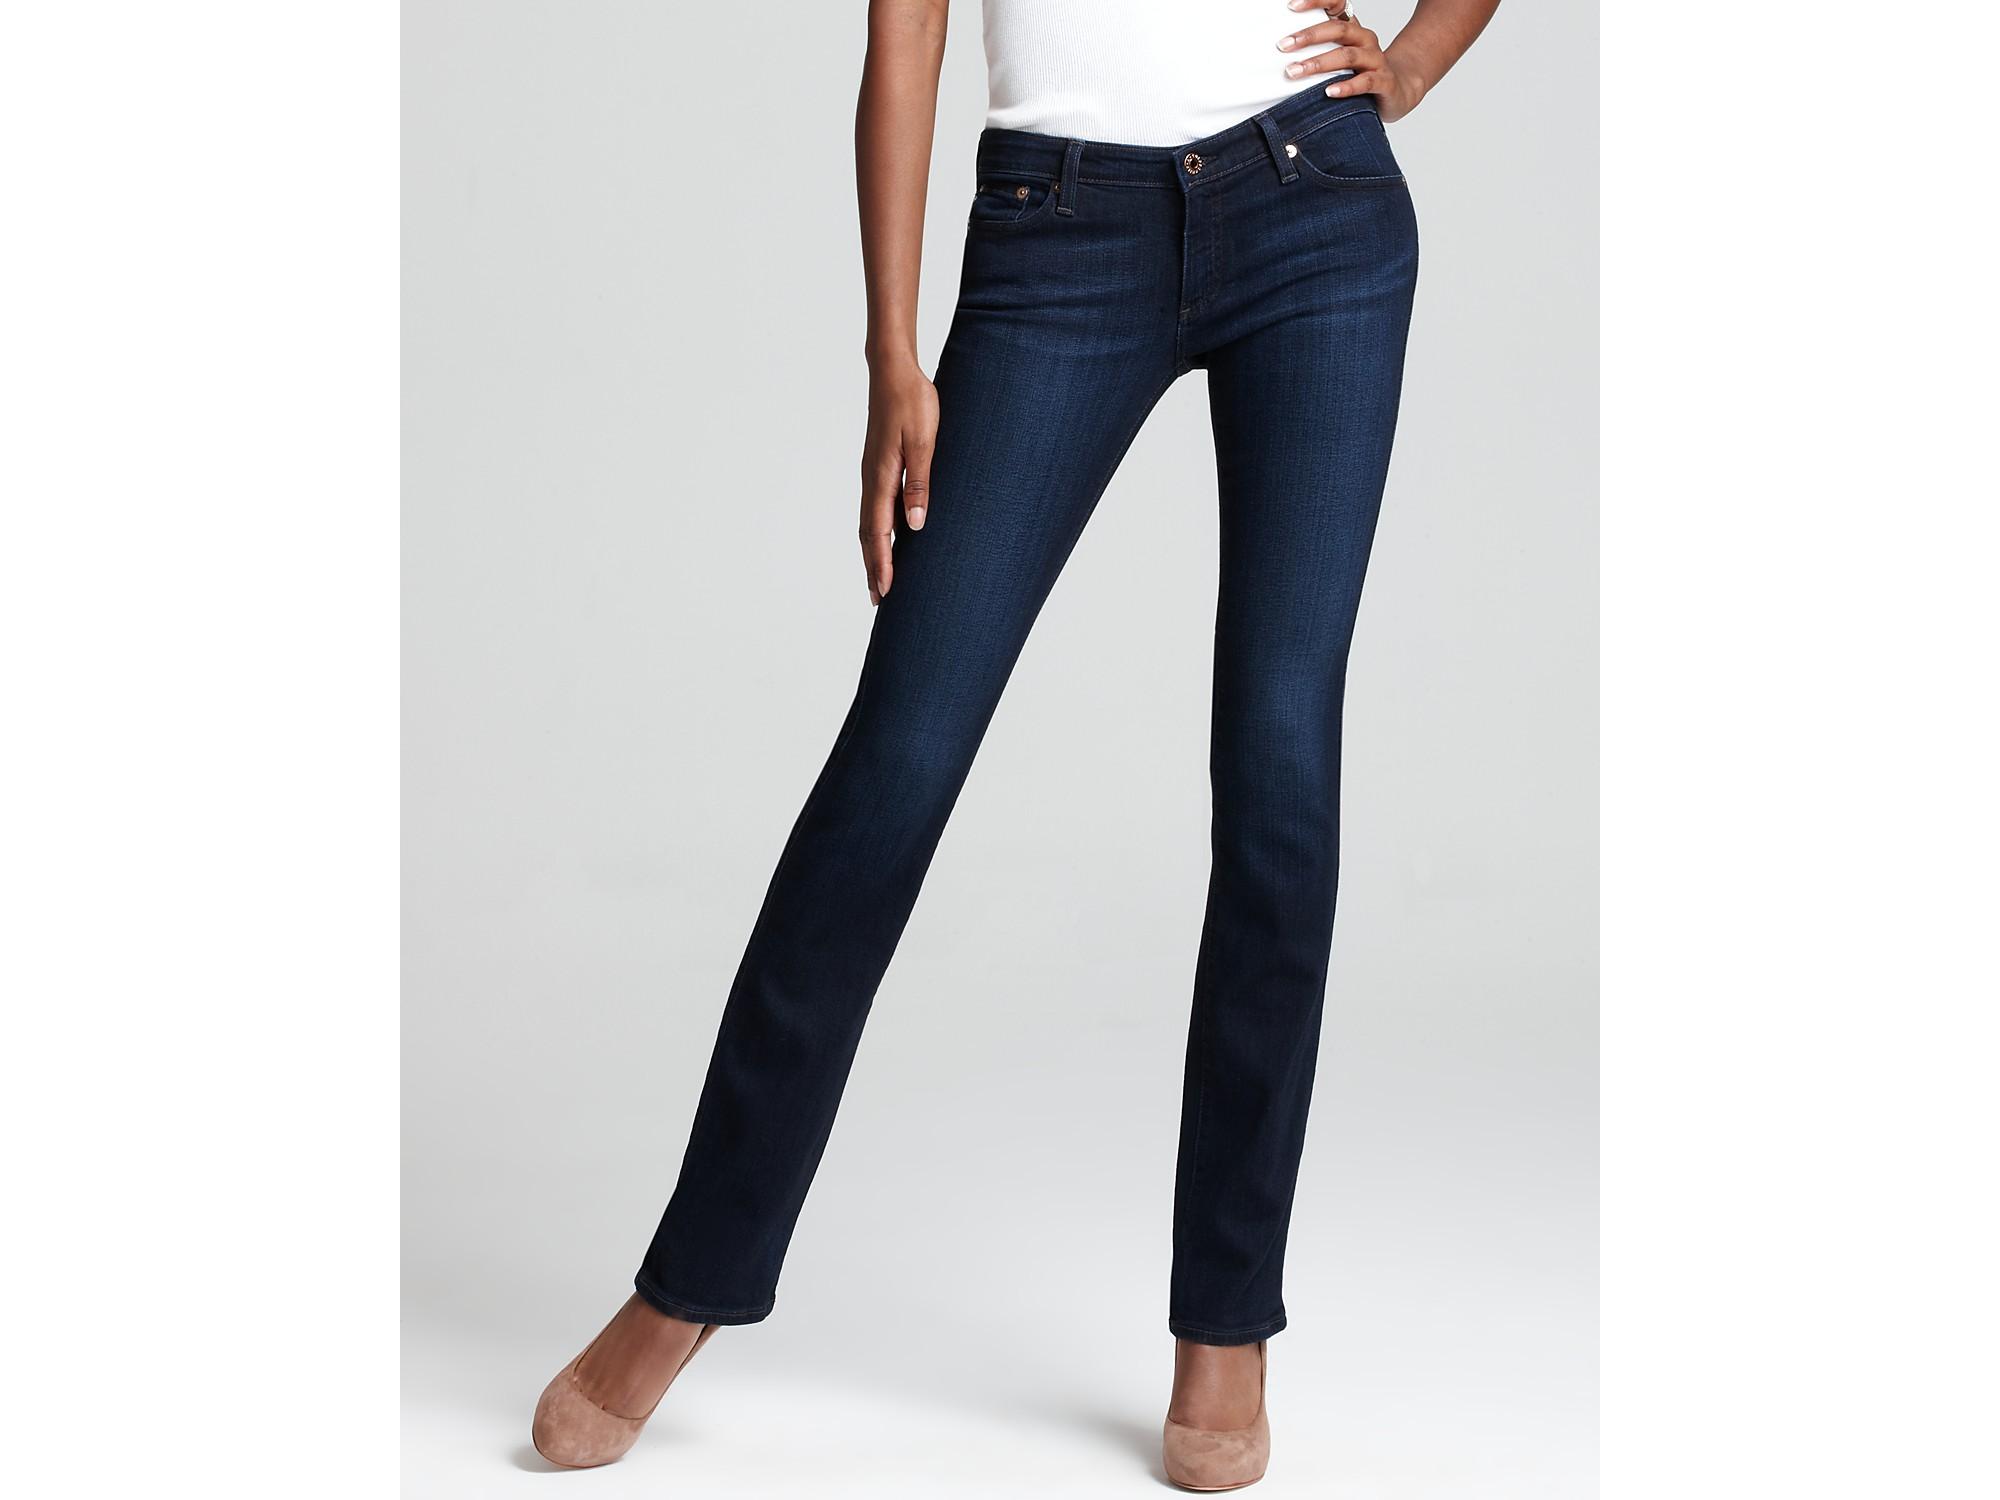 Ag jeans ballad slim bootcut